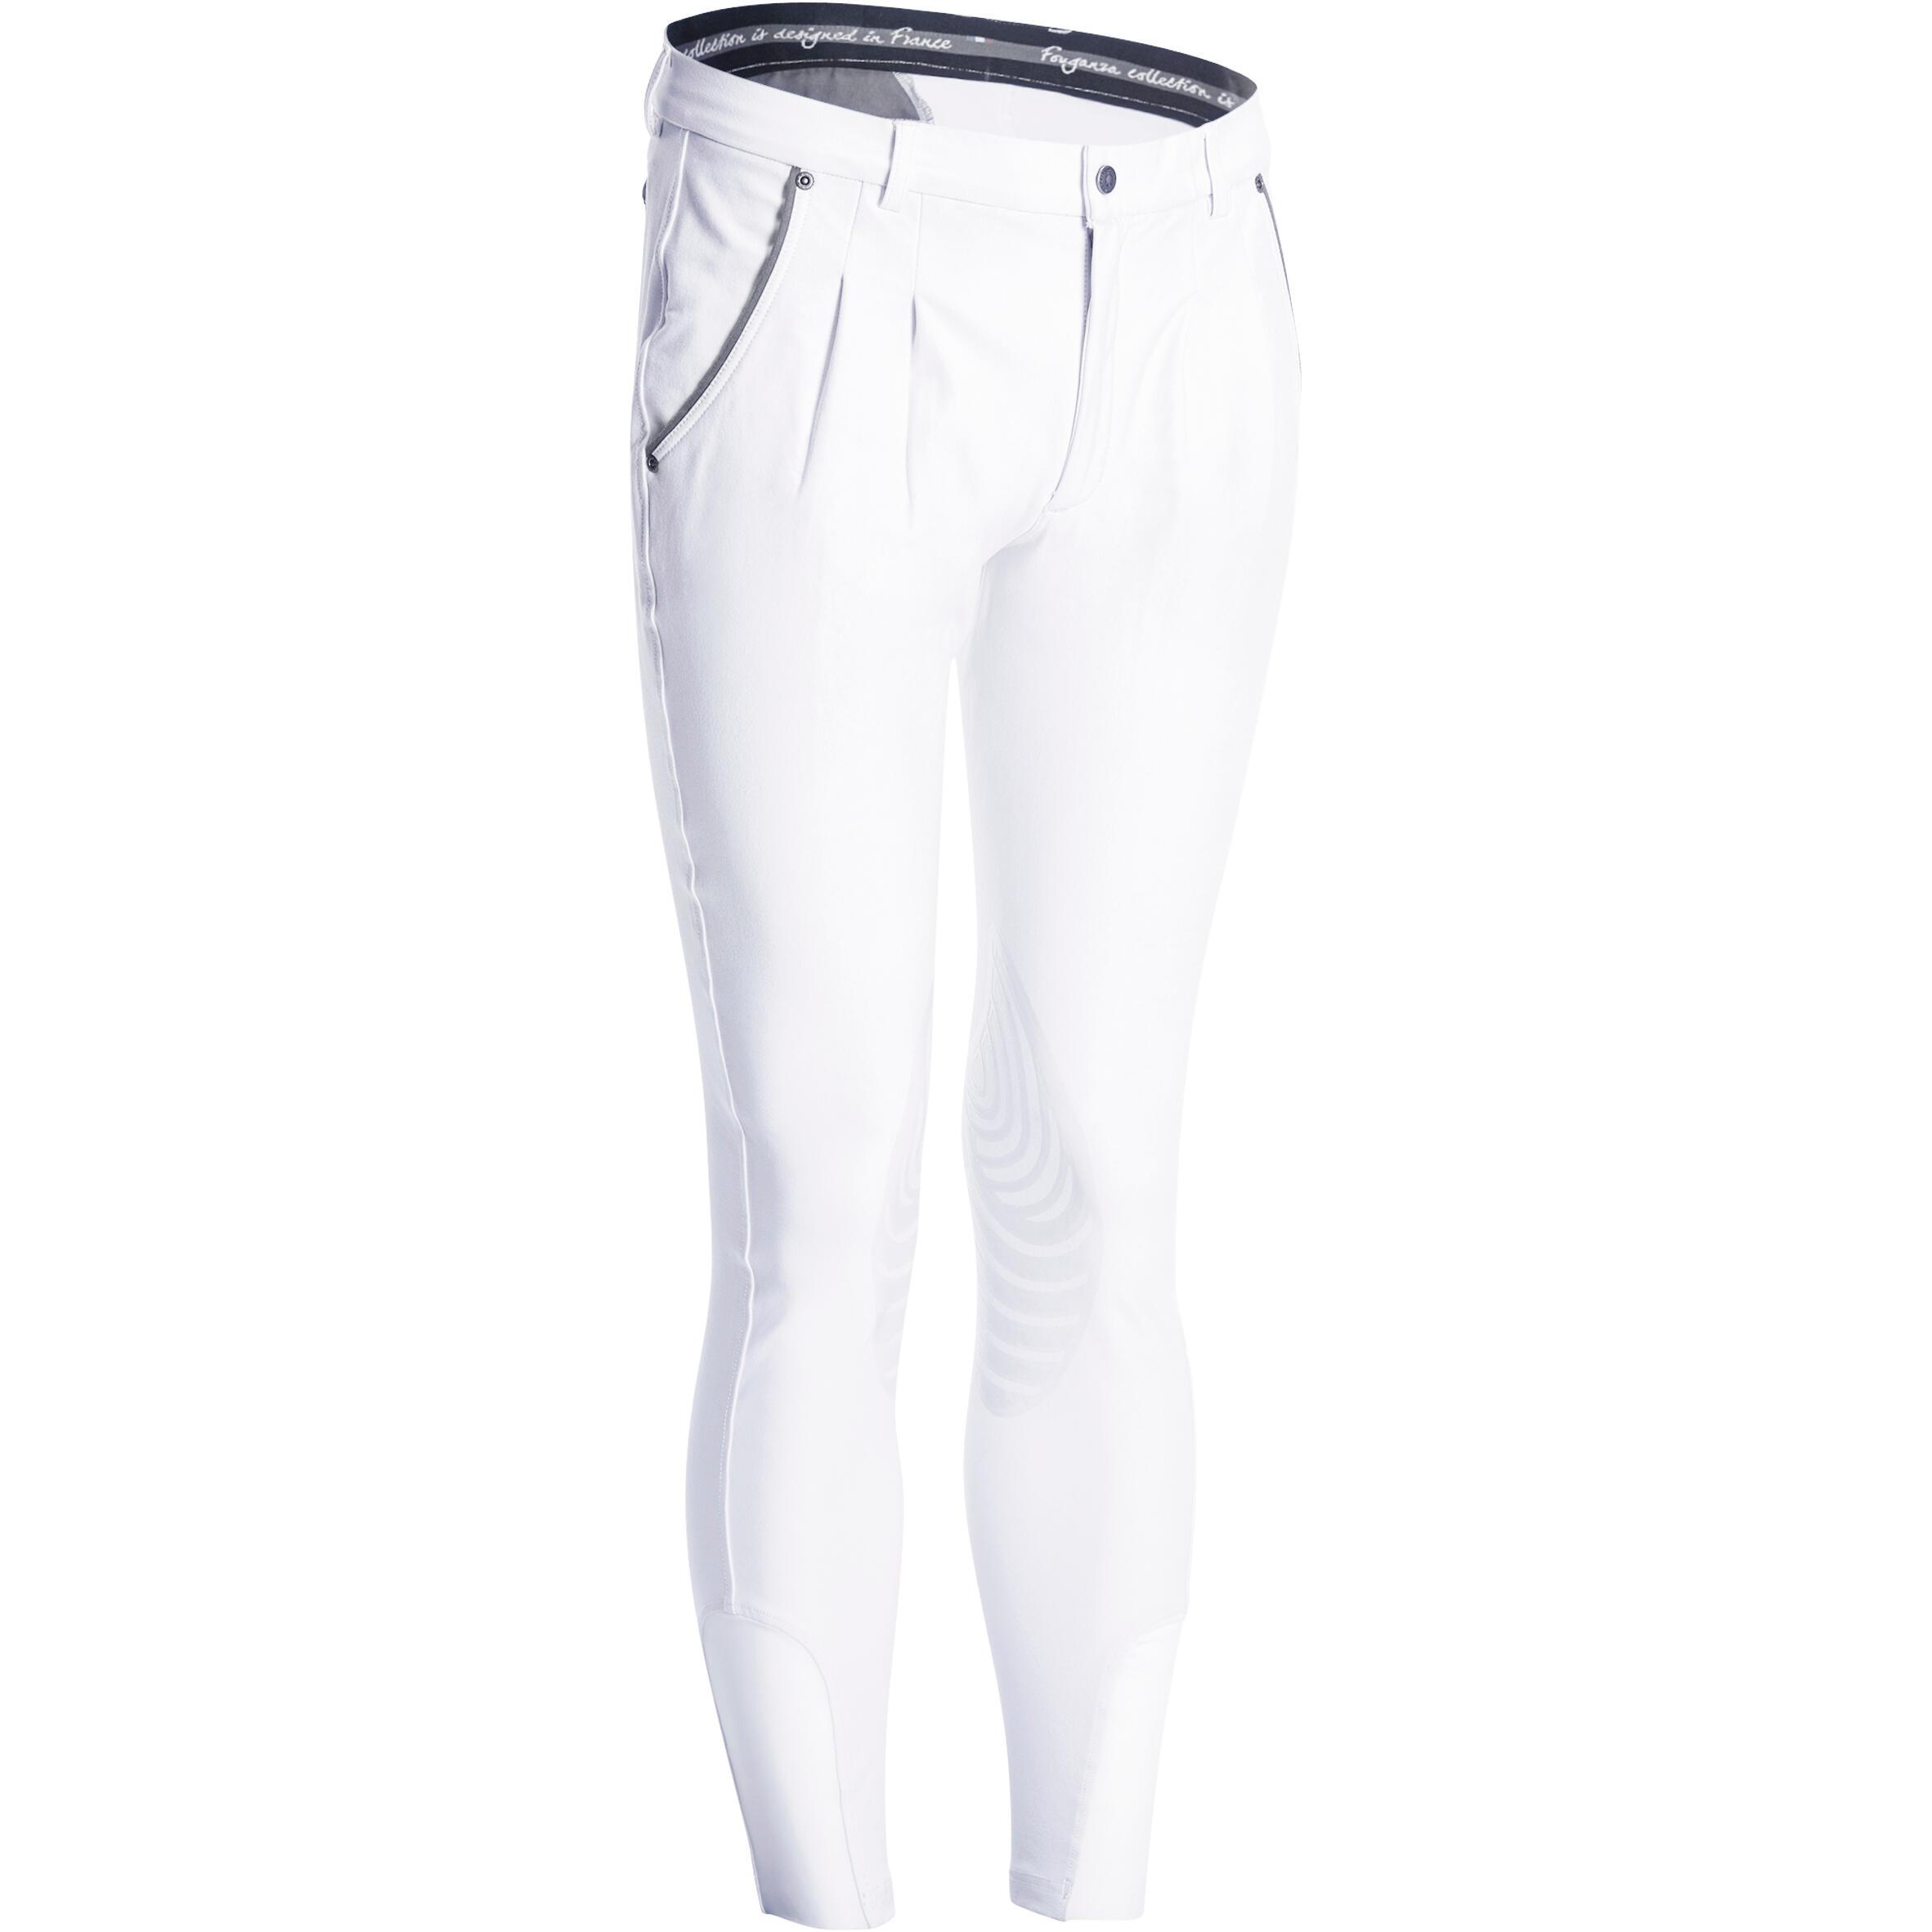 Pantalon echitație 560 Bărbați